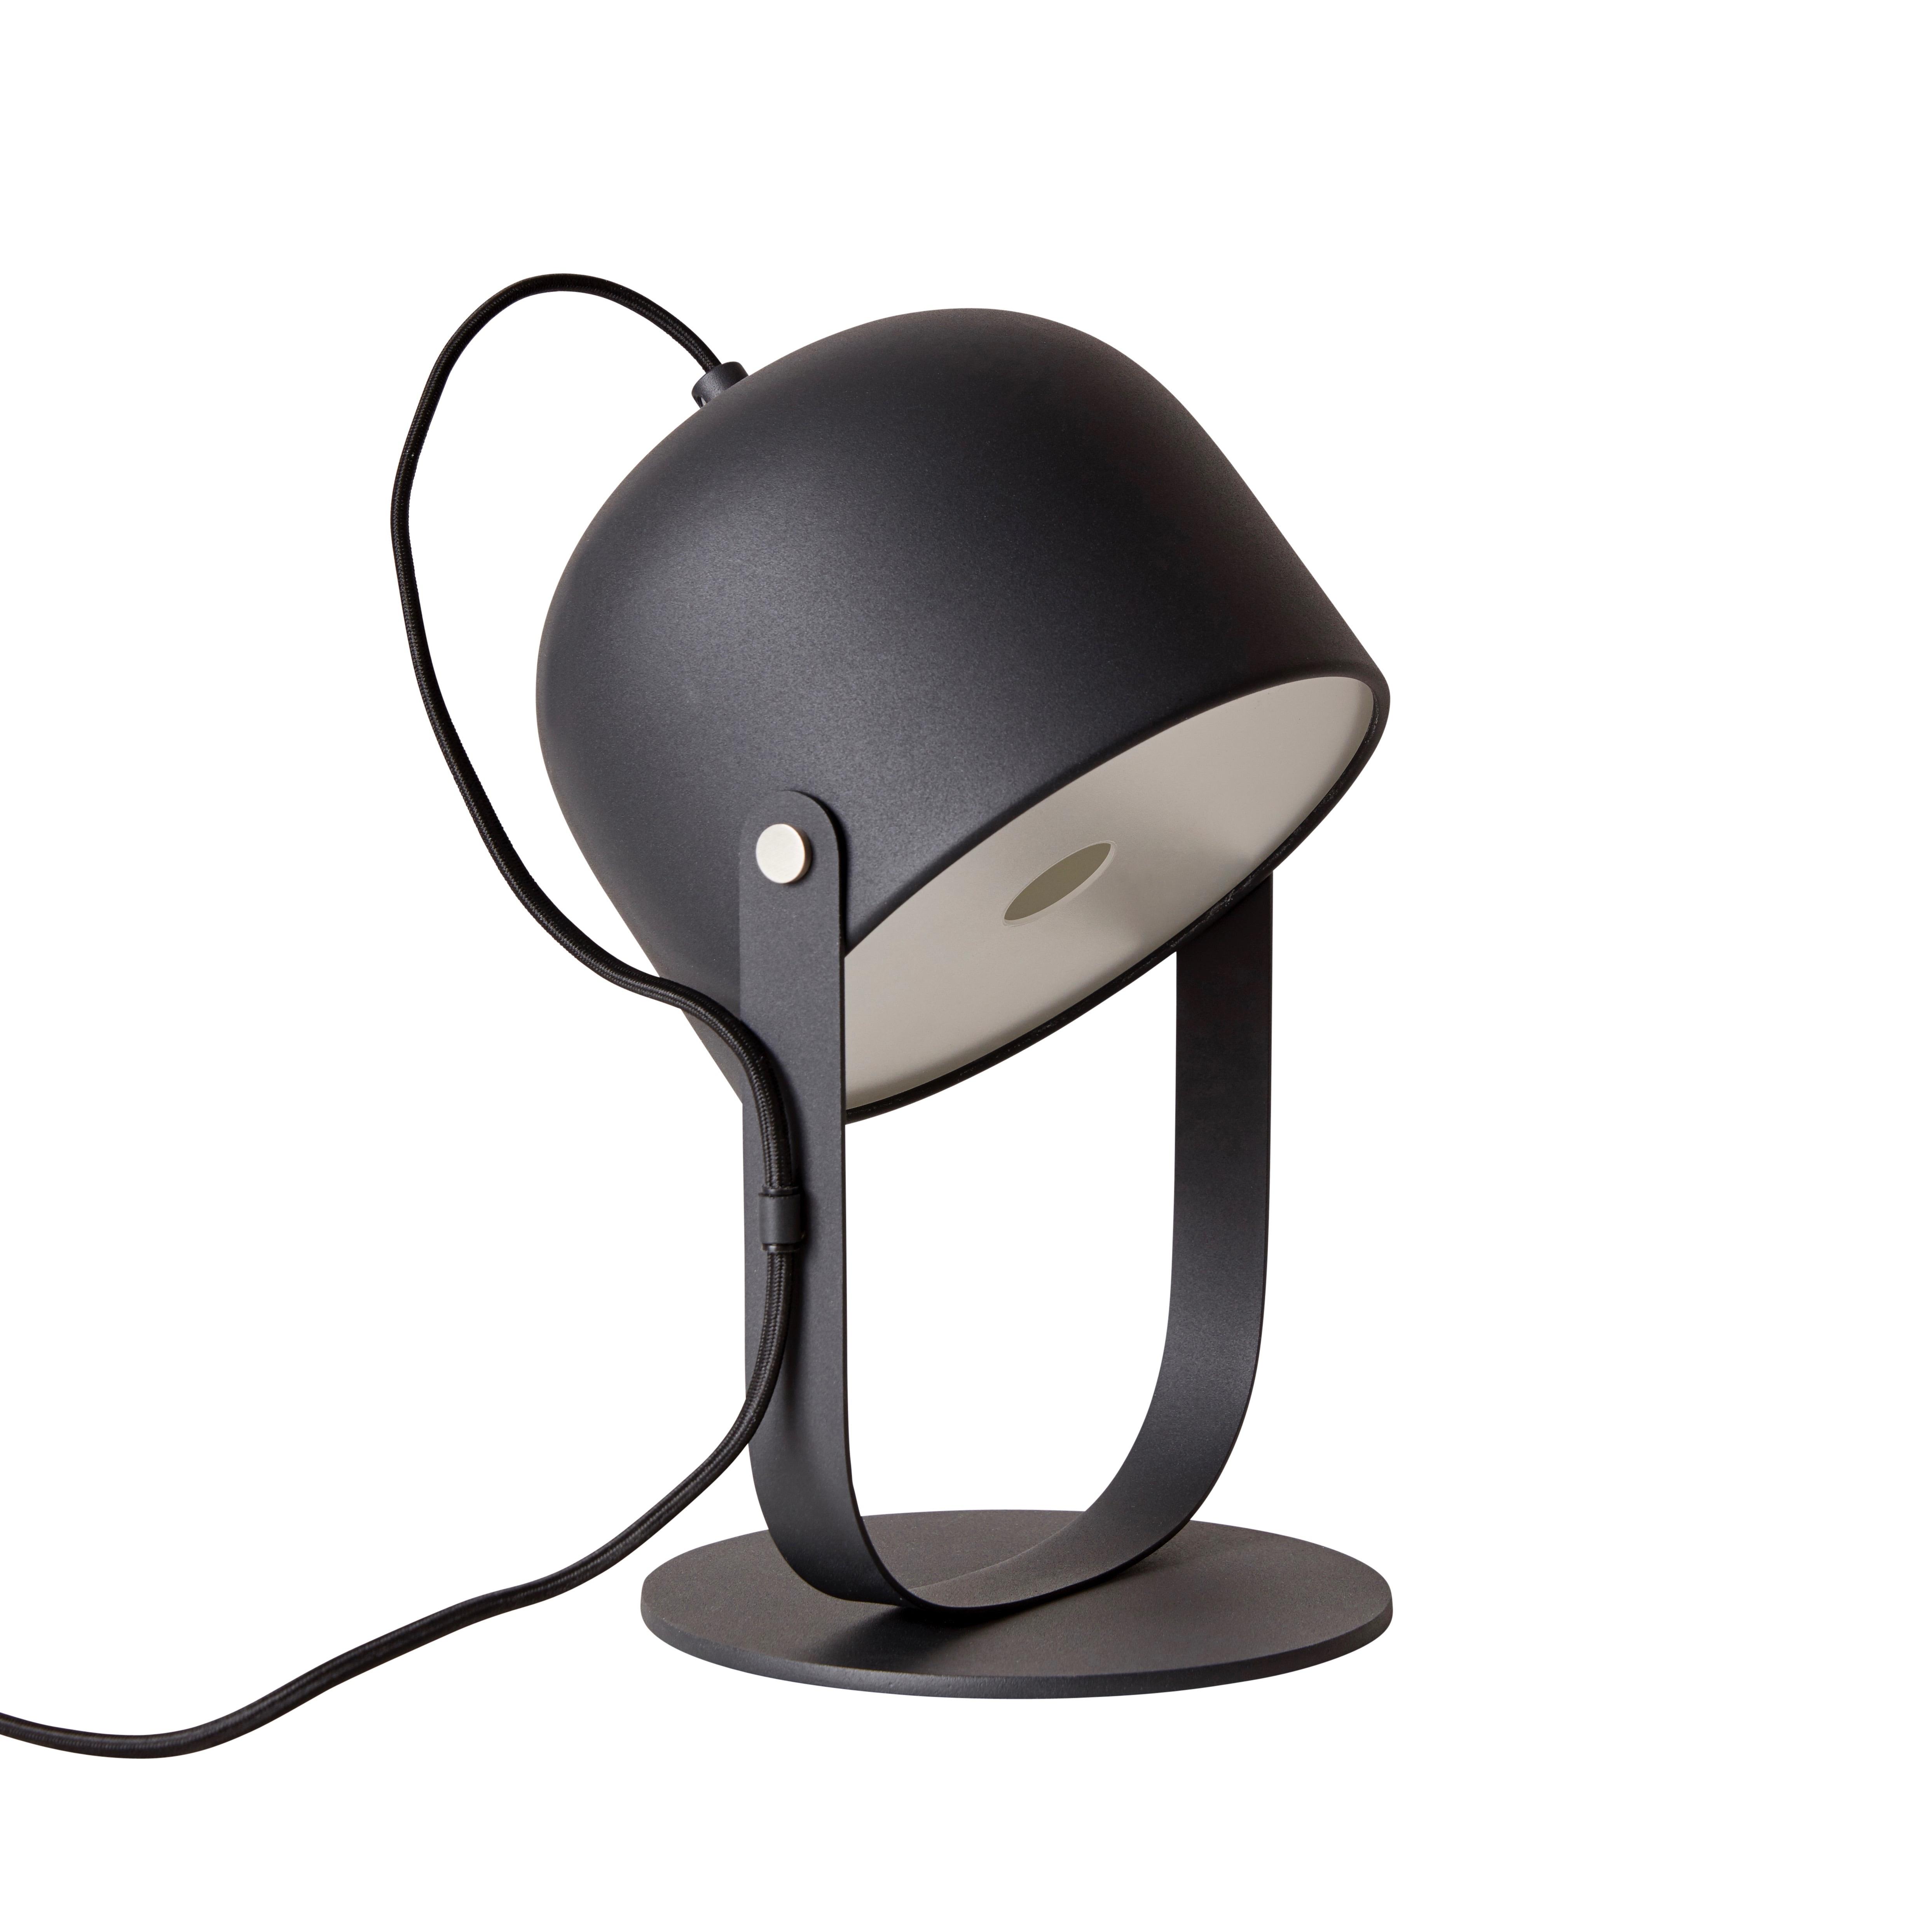 Svejk 18 bordslampa svart